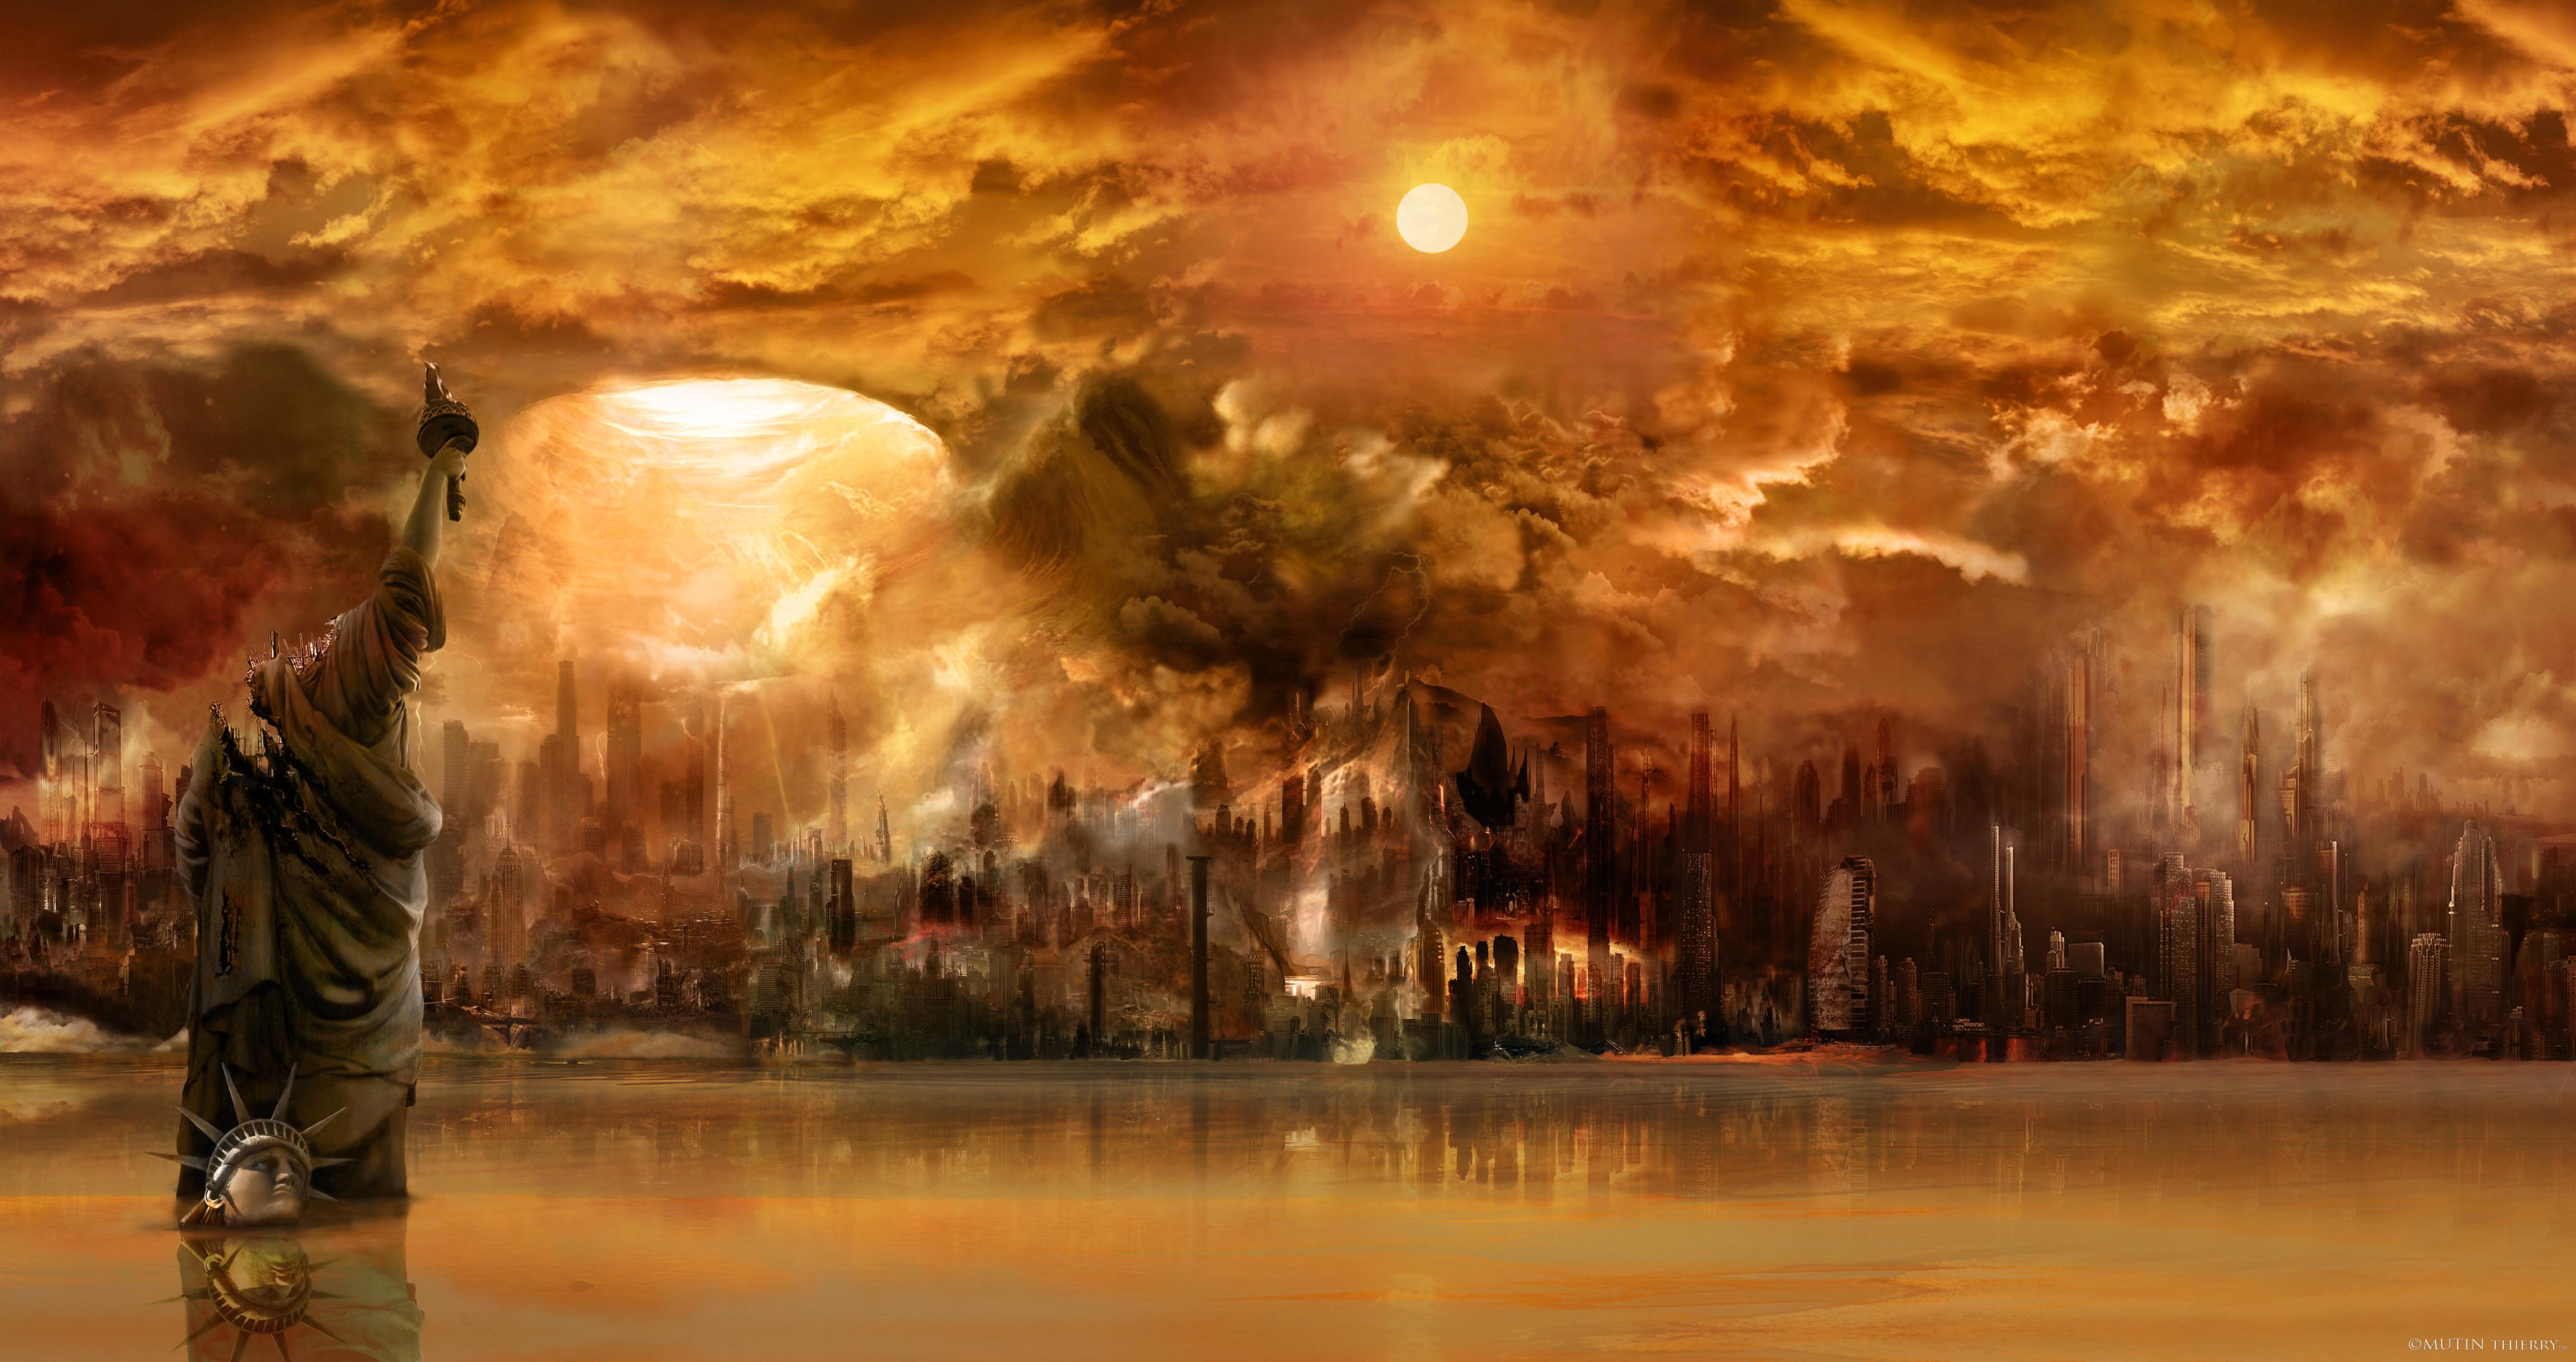 Apocalypse VI. Thierry Mutin 2017